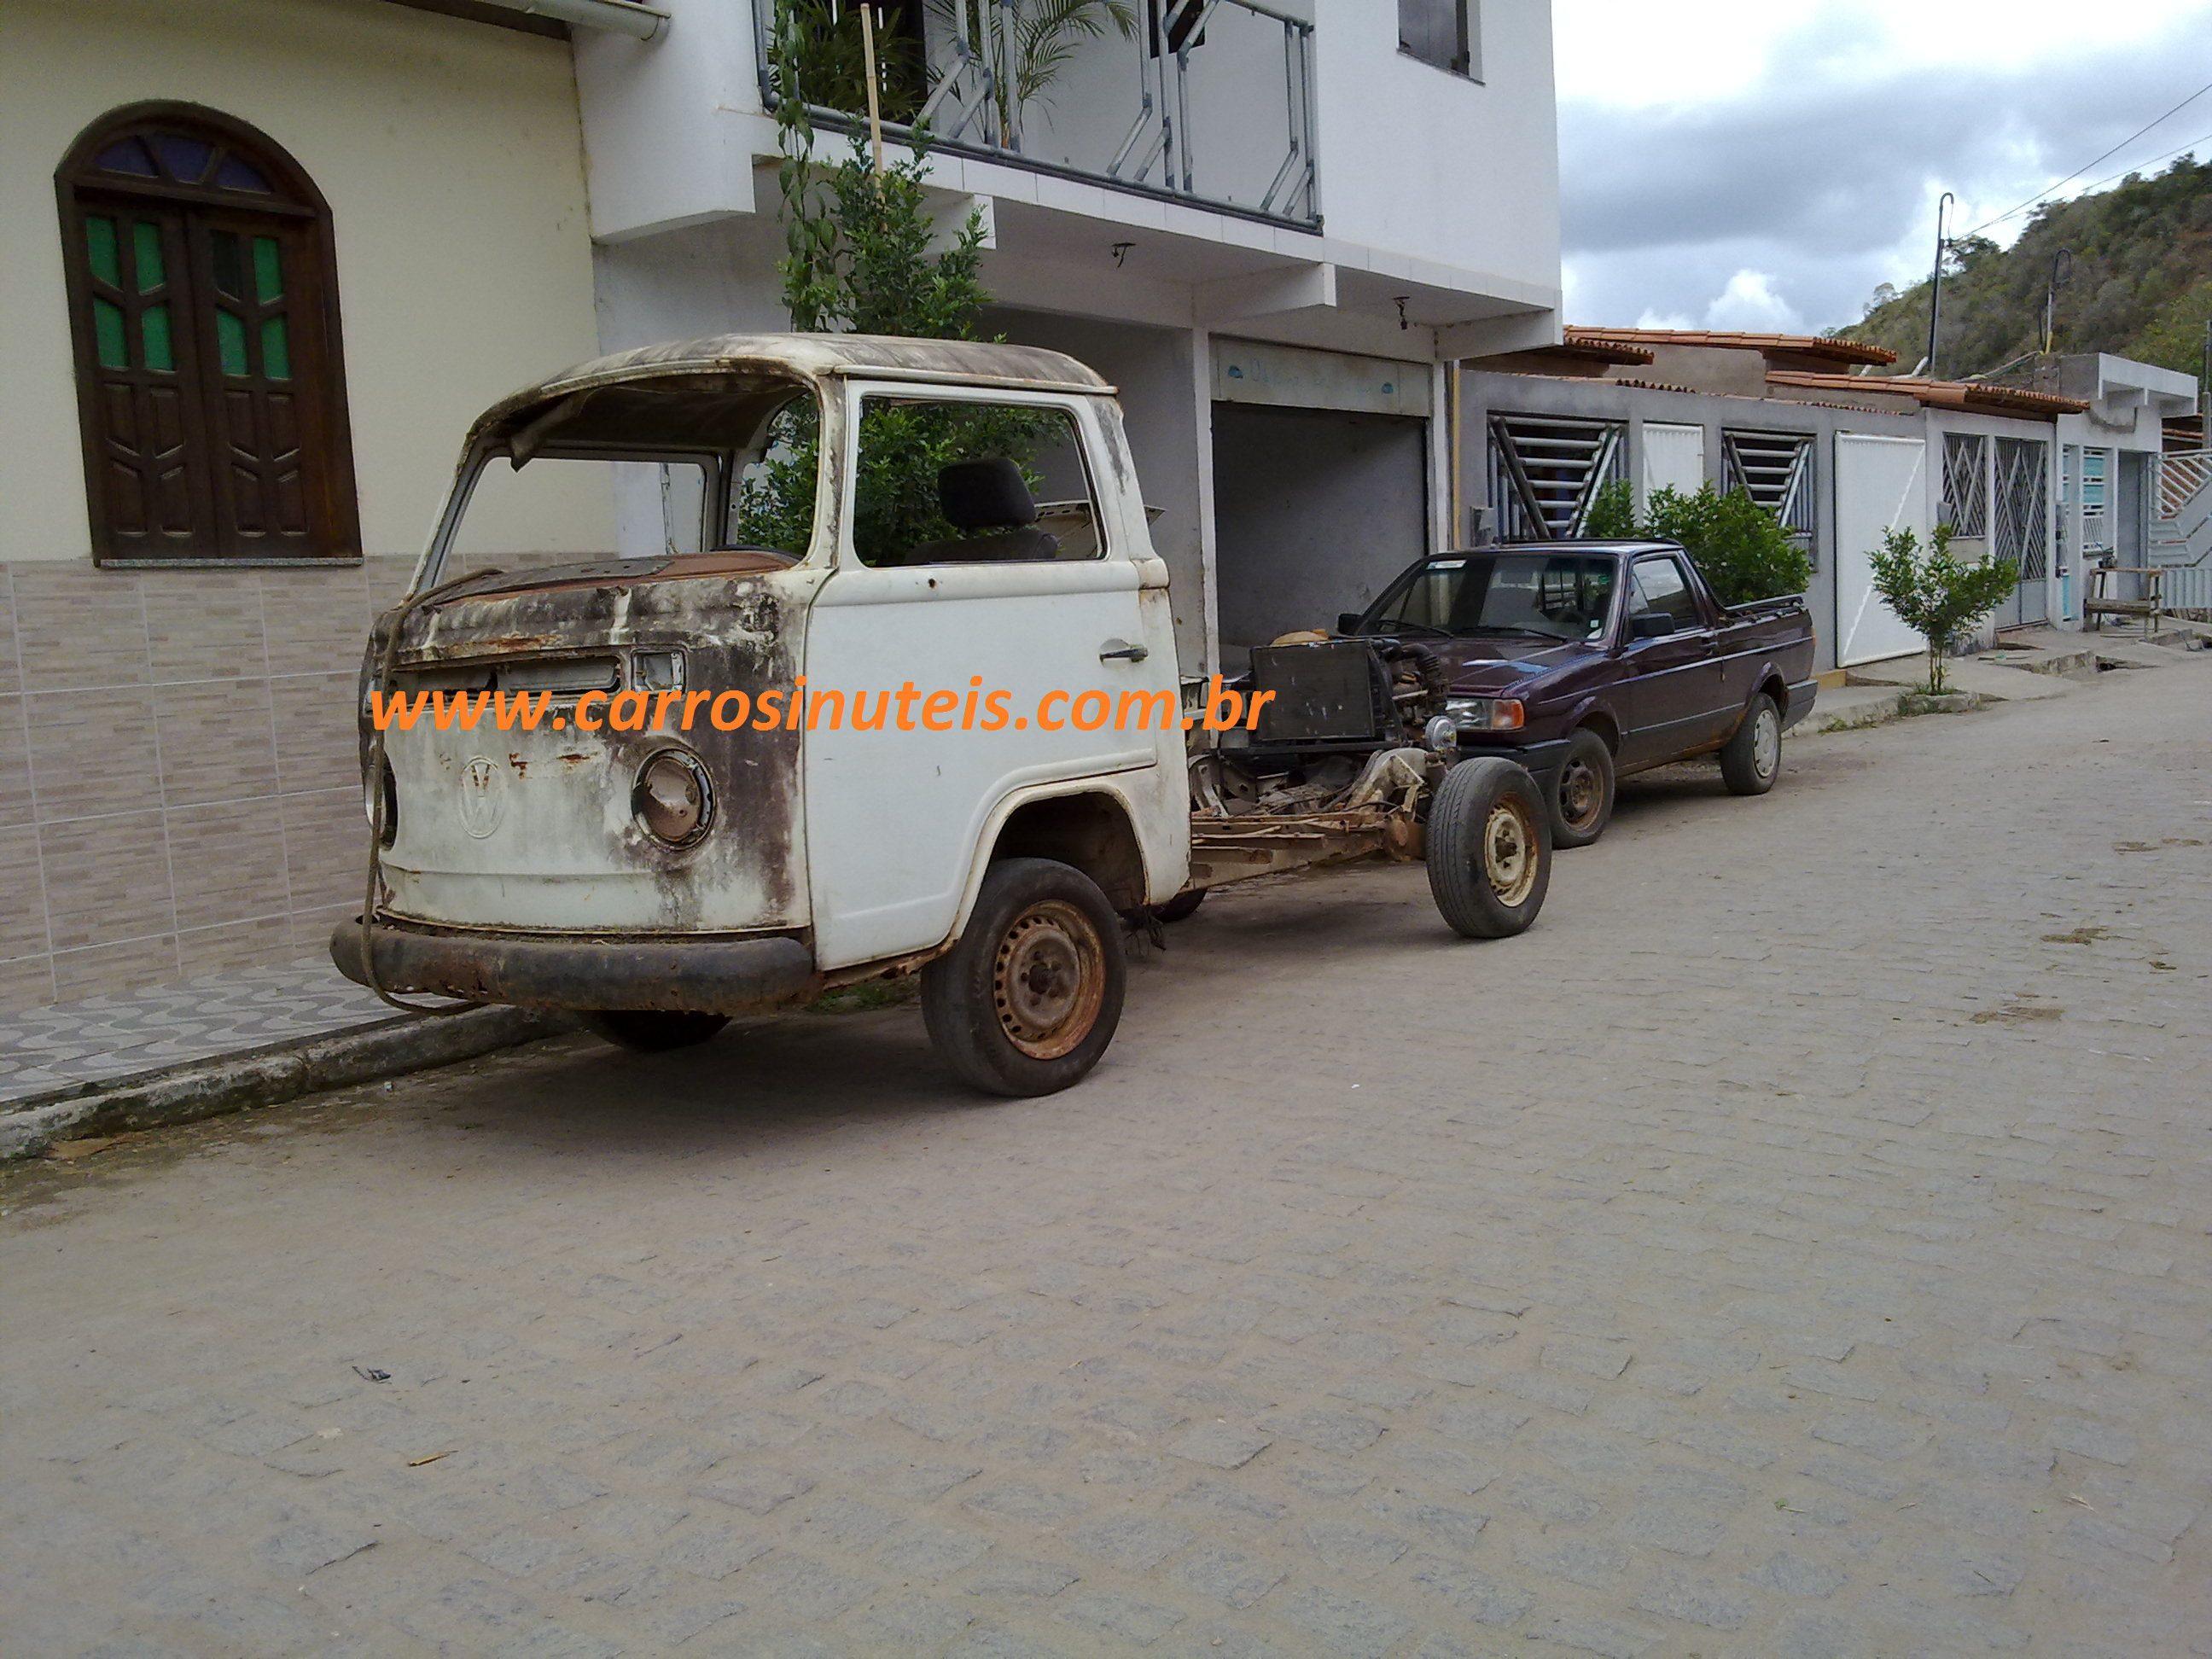 junin-vw-kombi-ubaira-bahia VW Kombi, Ubaíra, Bahia, por Junin